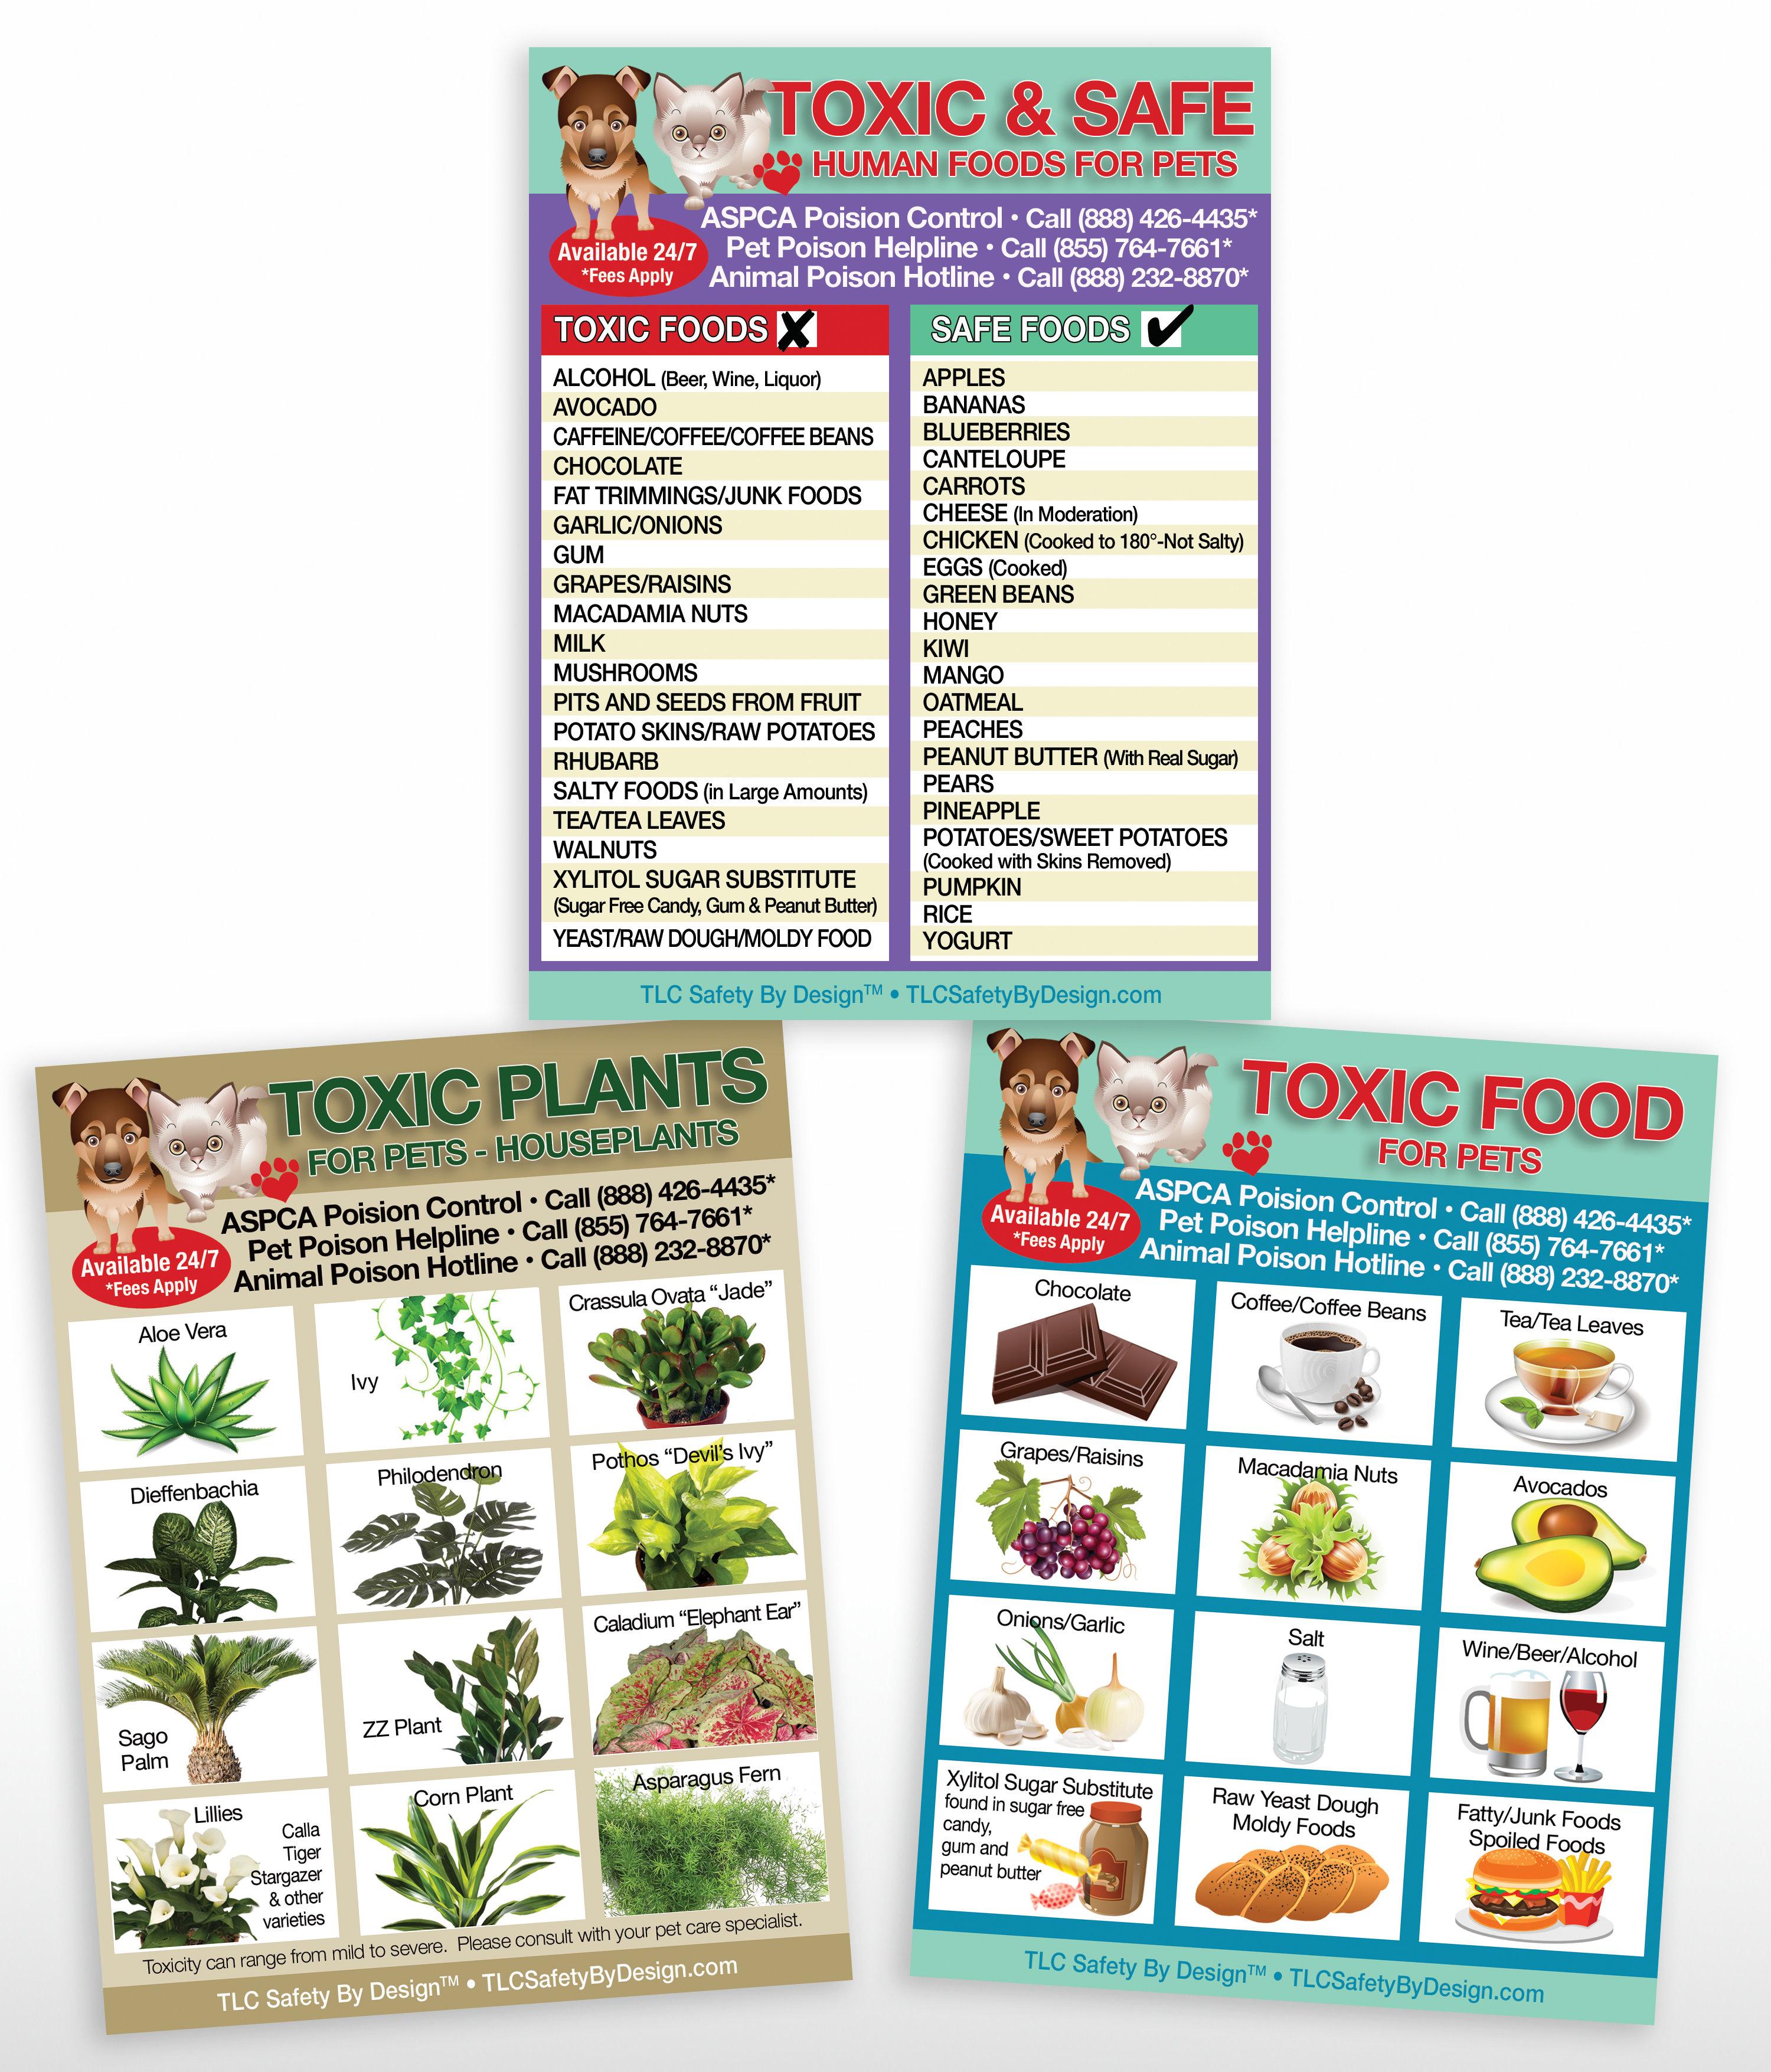 Set 3 Toxic Food Safe Plants Variety Pack Poison For Pets Magnet